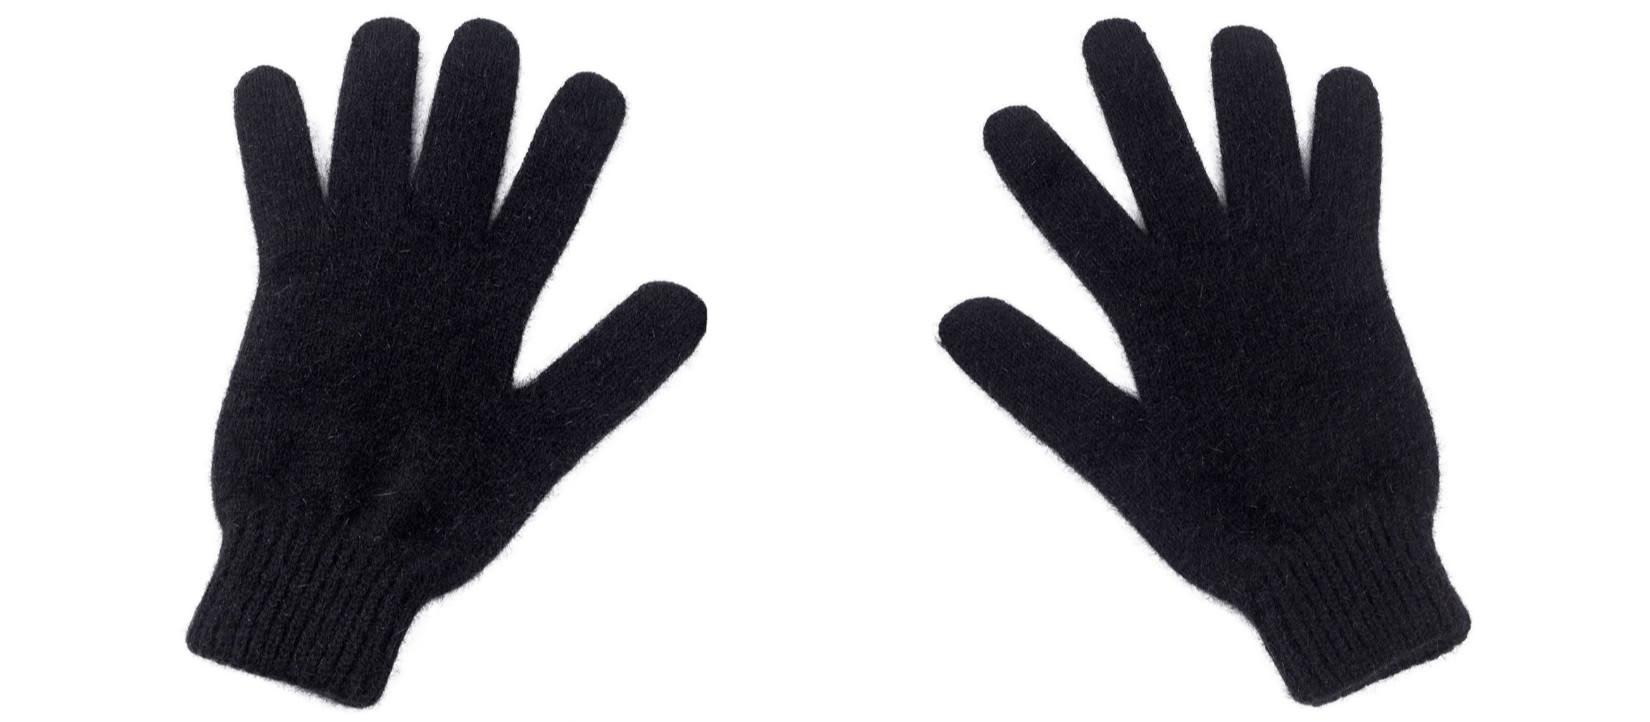 Possumdown Wool Gloves Hi-loft